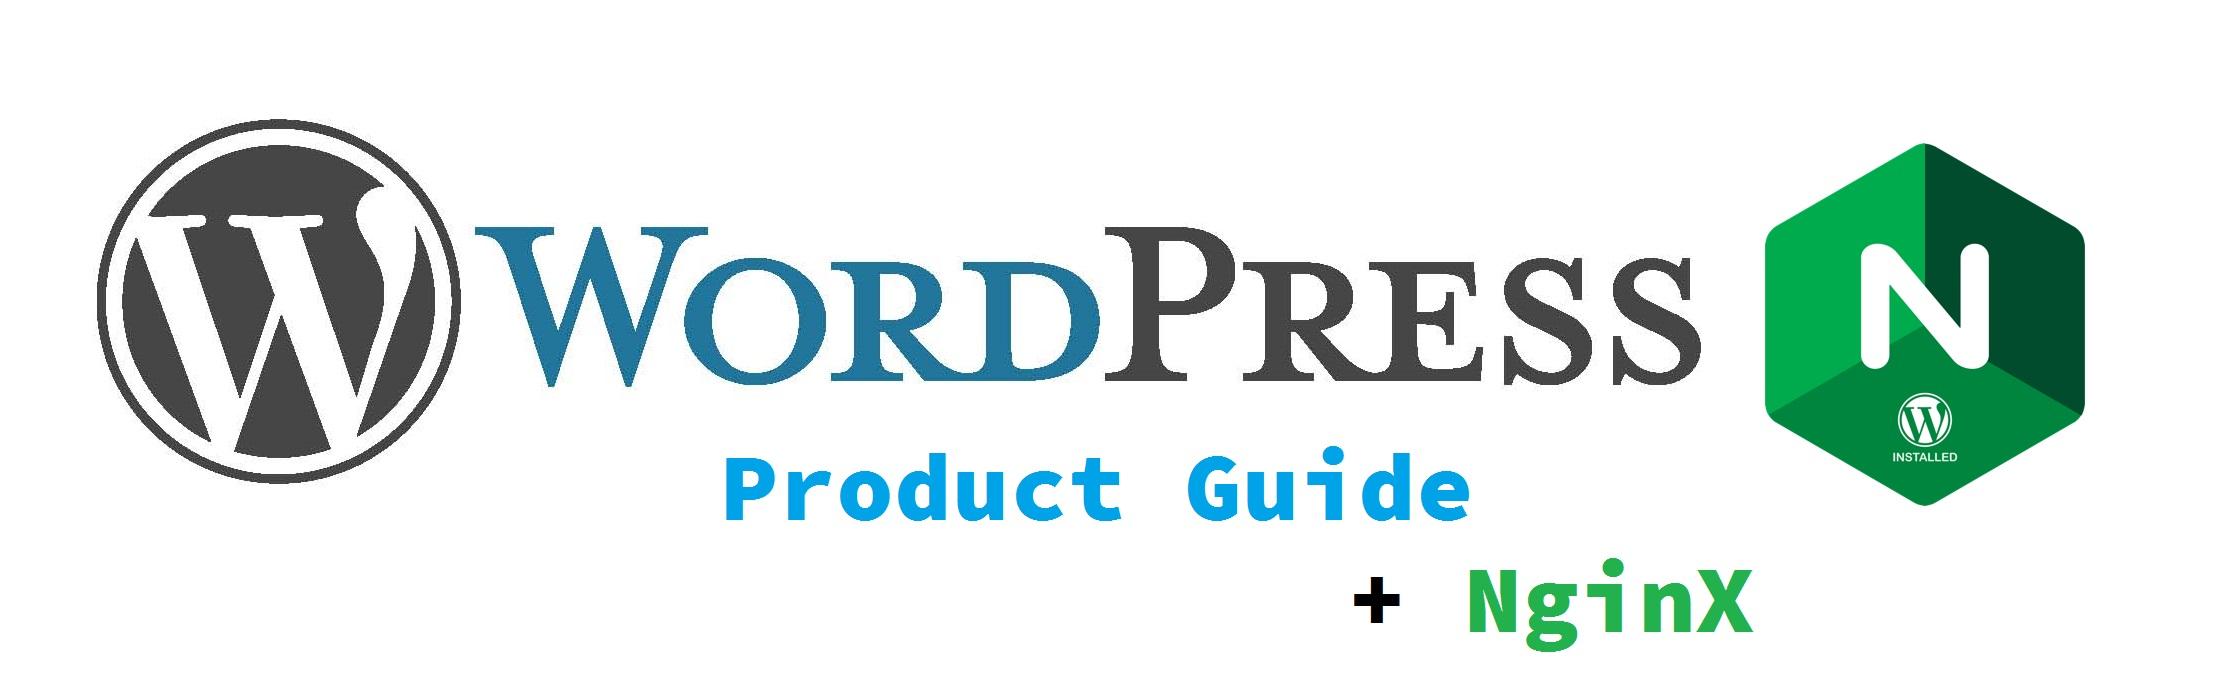 Product Guide – WordPress Hosting